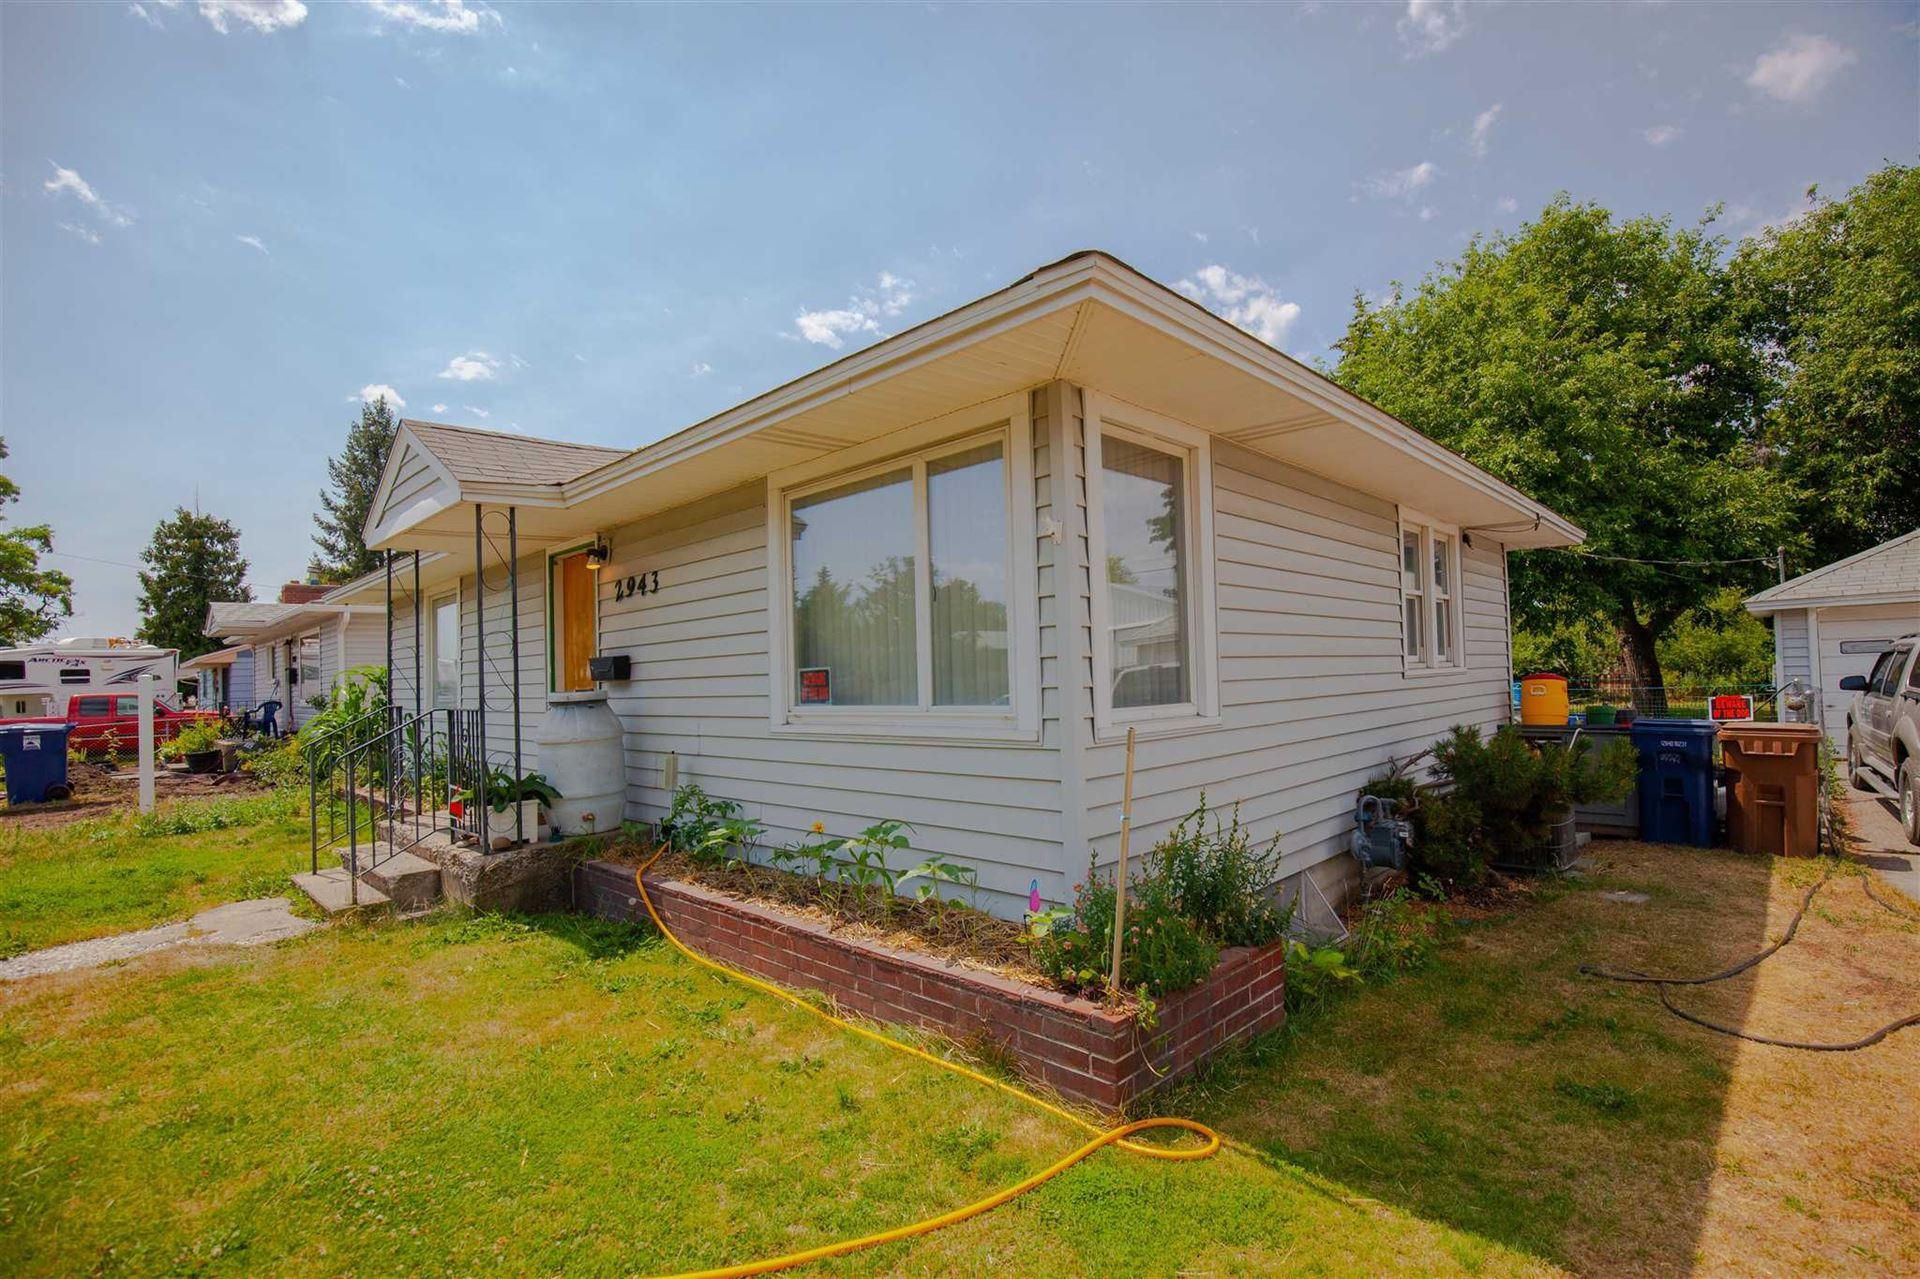 2943 N Smith St, Spokane, WA 99207 - #: 202118399